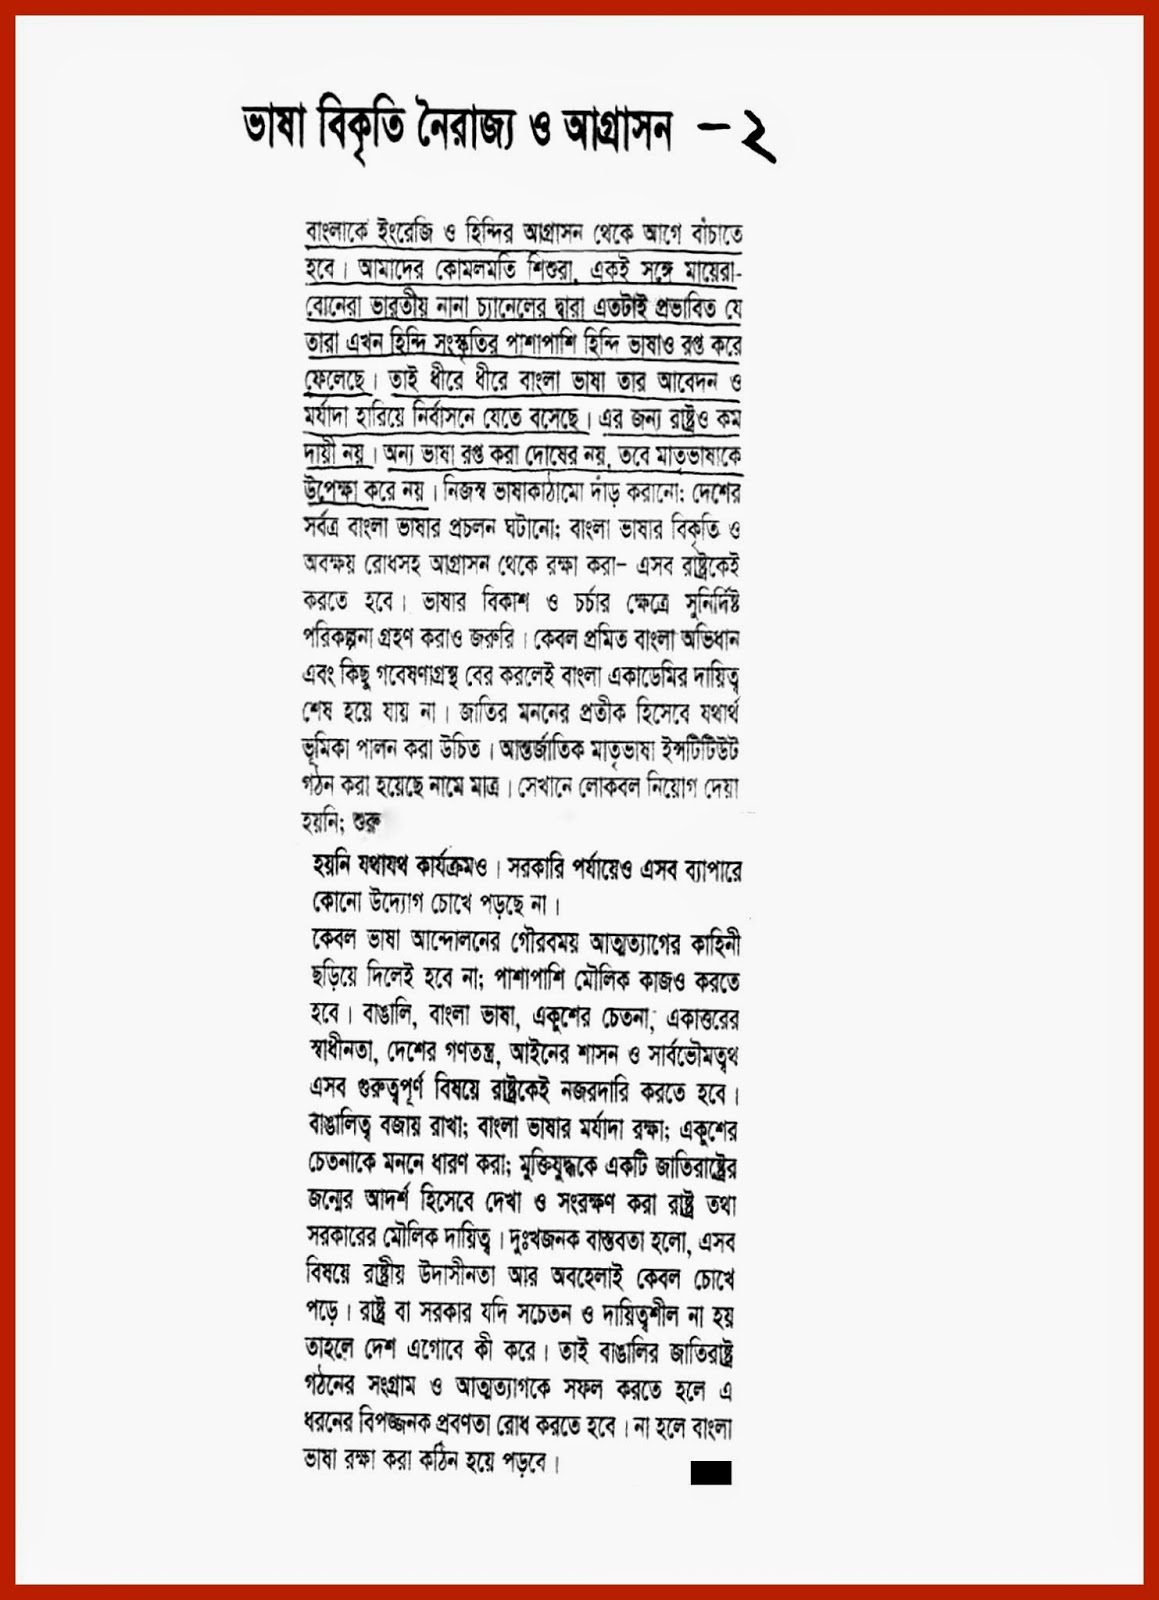 Help in writing essay bengali language